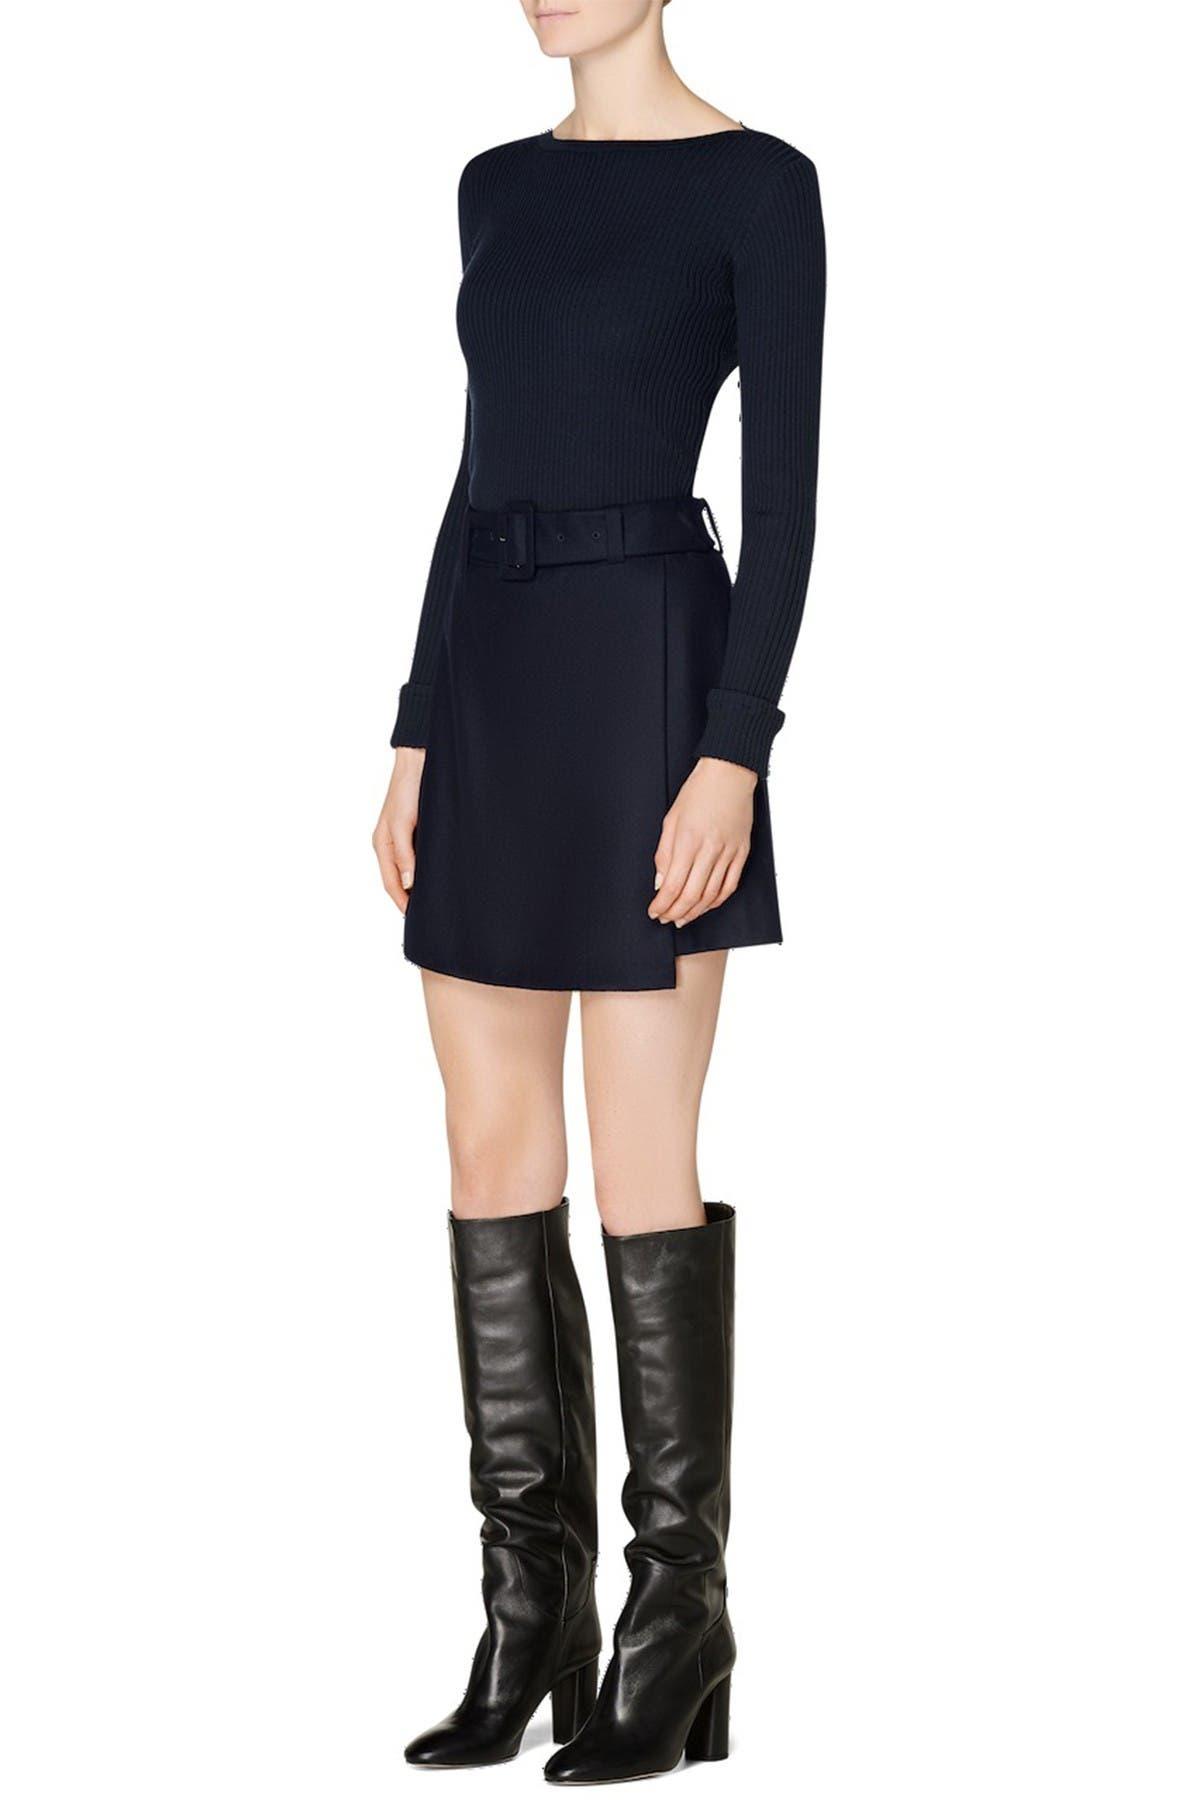 Image of SUISTUDIO Calvin Wool Skirt